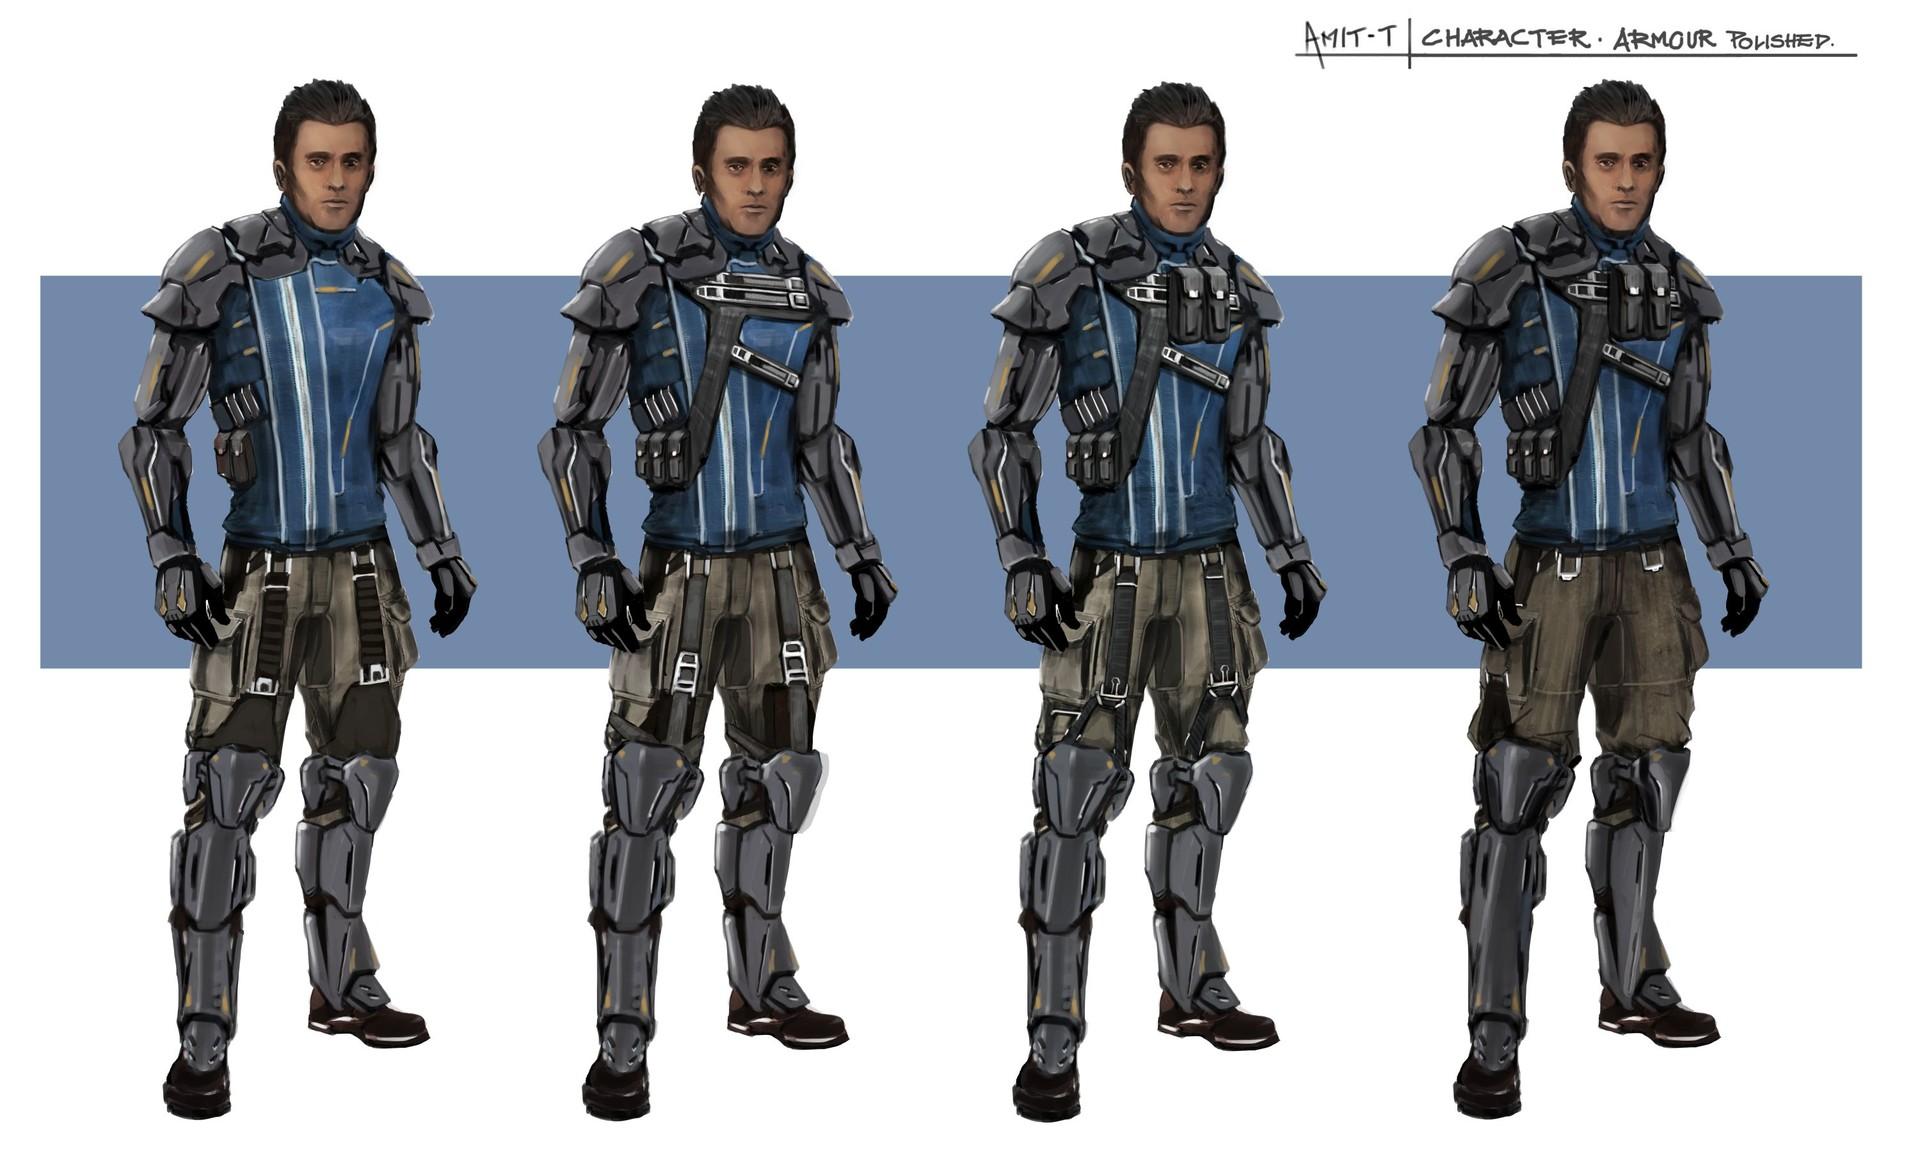 Sci Fi character costume design